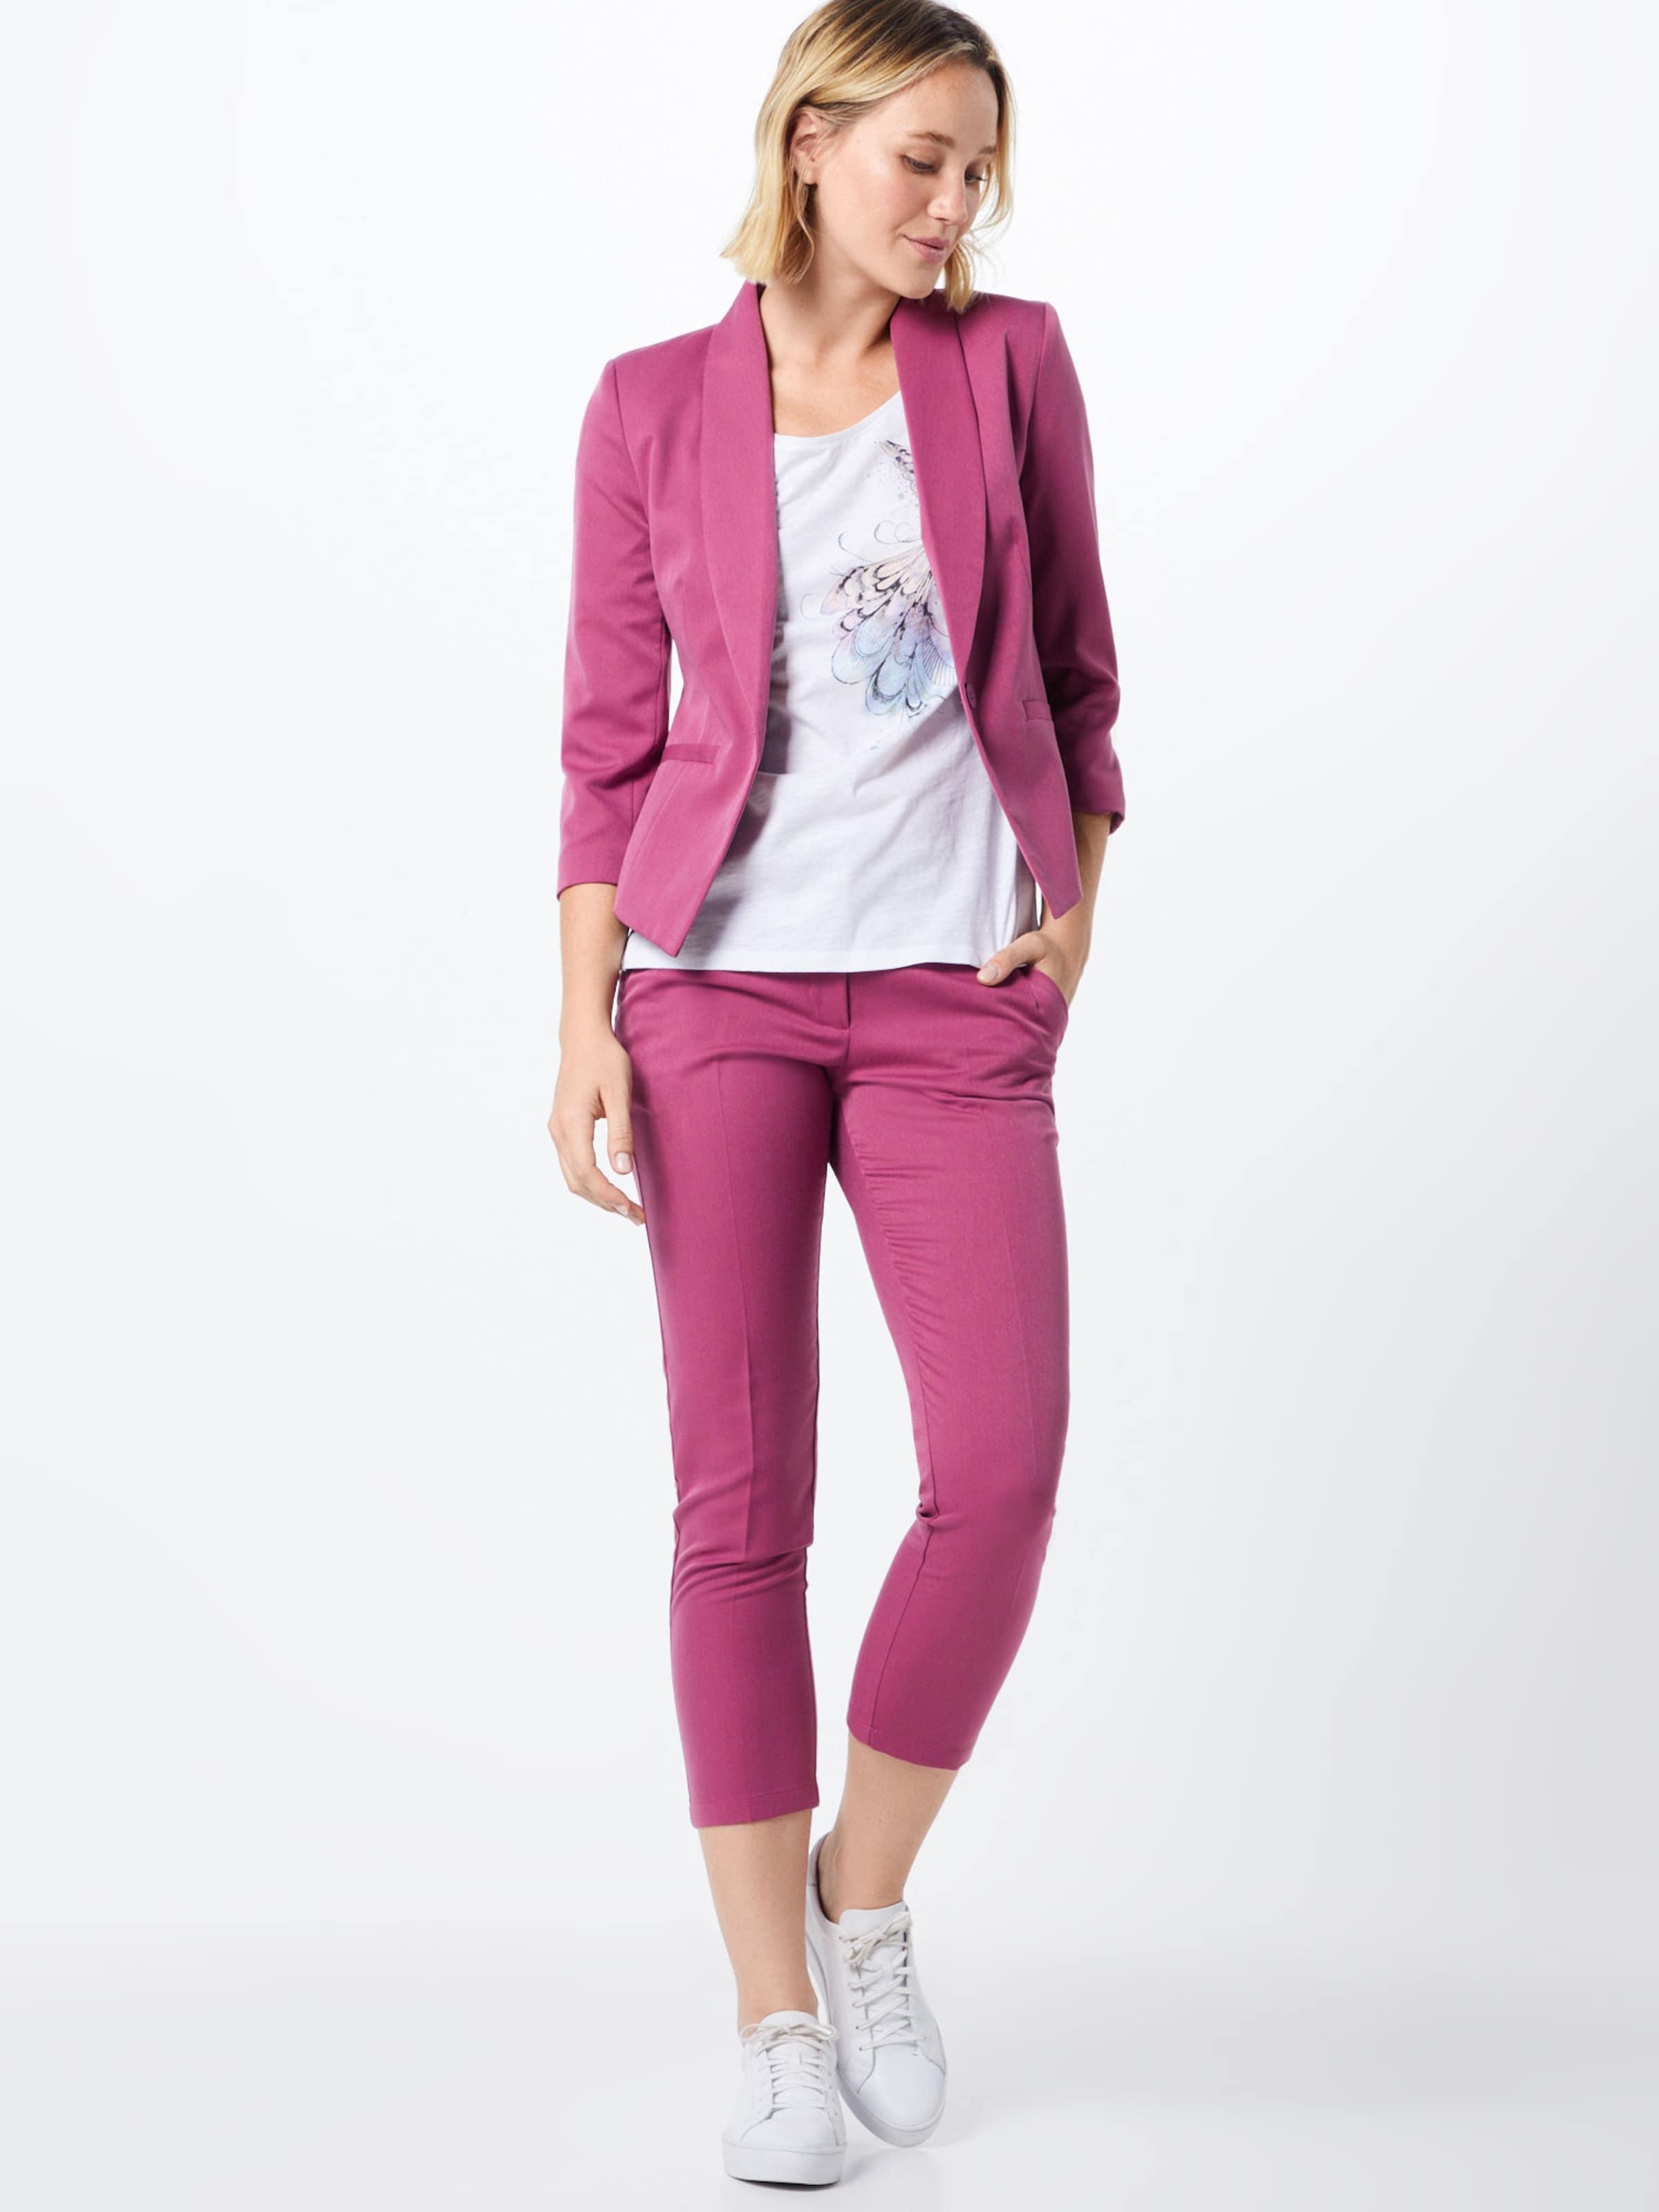 Esprit Or T Edc By Bleu shirt MarineClair En Rose qUVLSzpMG